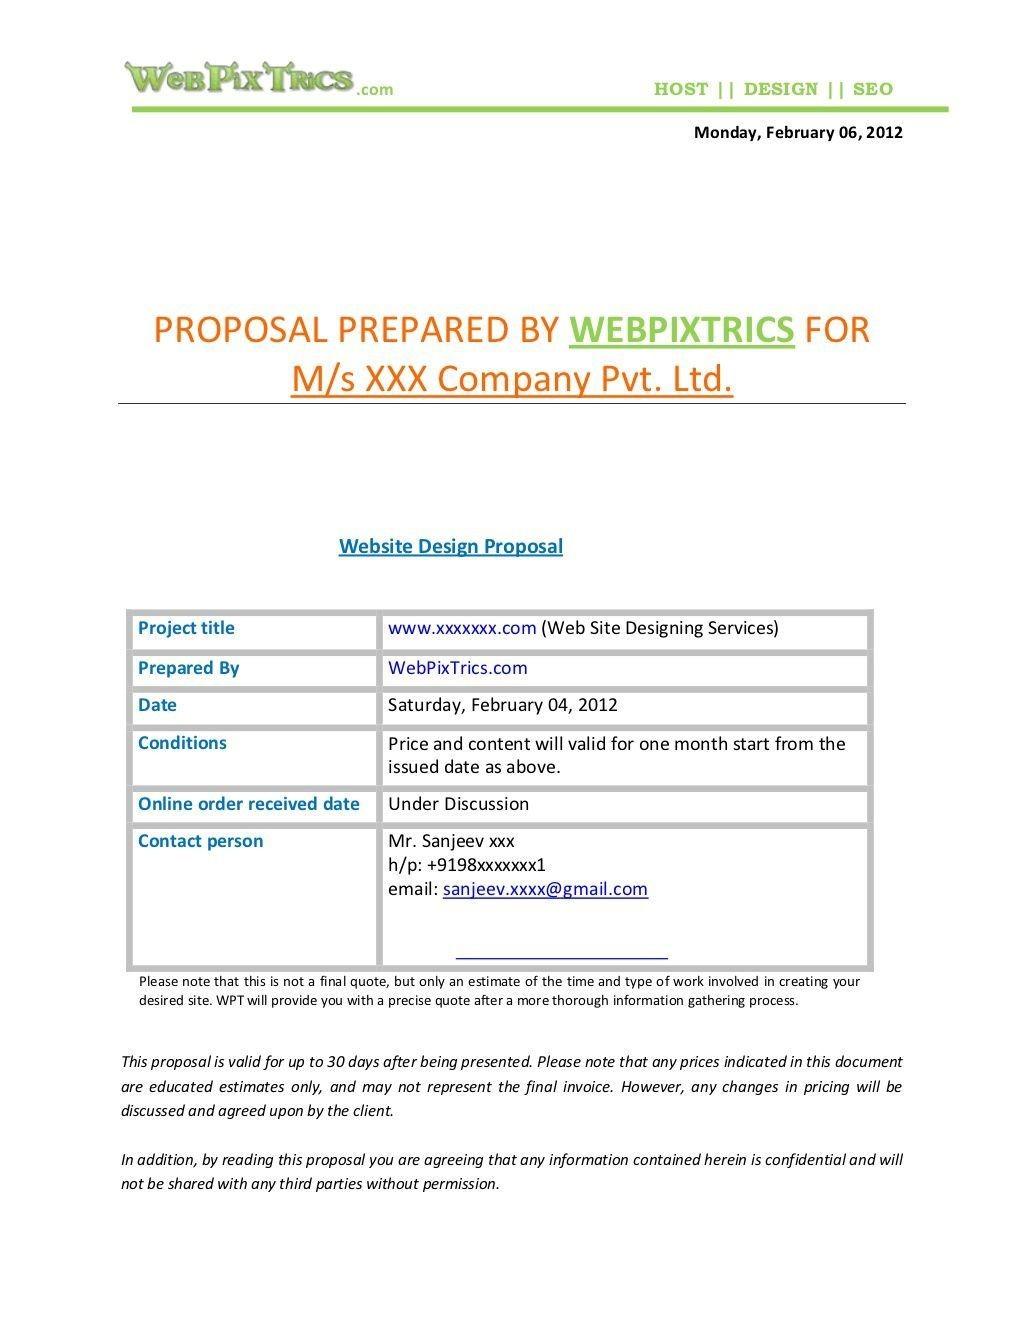 007 Stunning Web Design Proposal Template Free High Definition  Freelance DownloadLarge